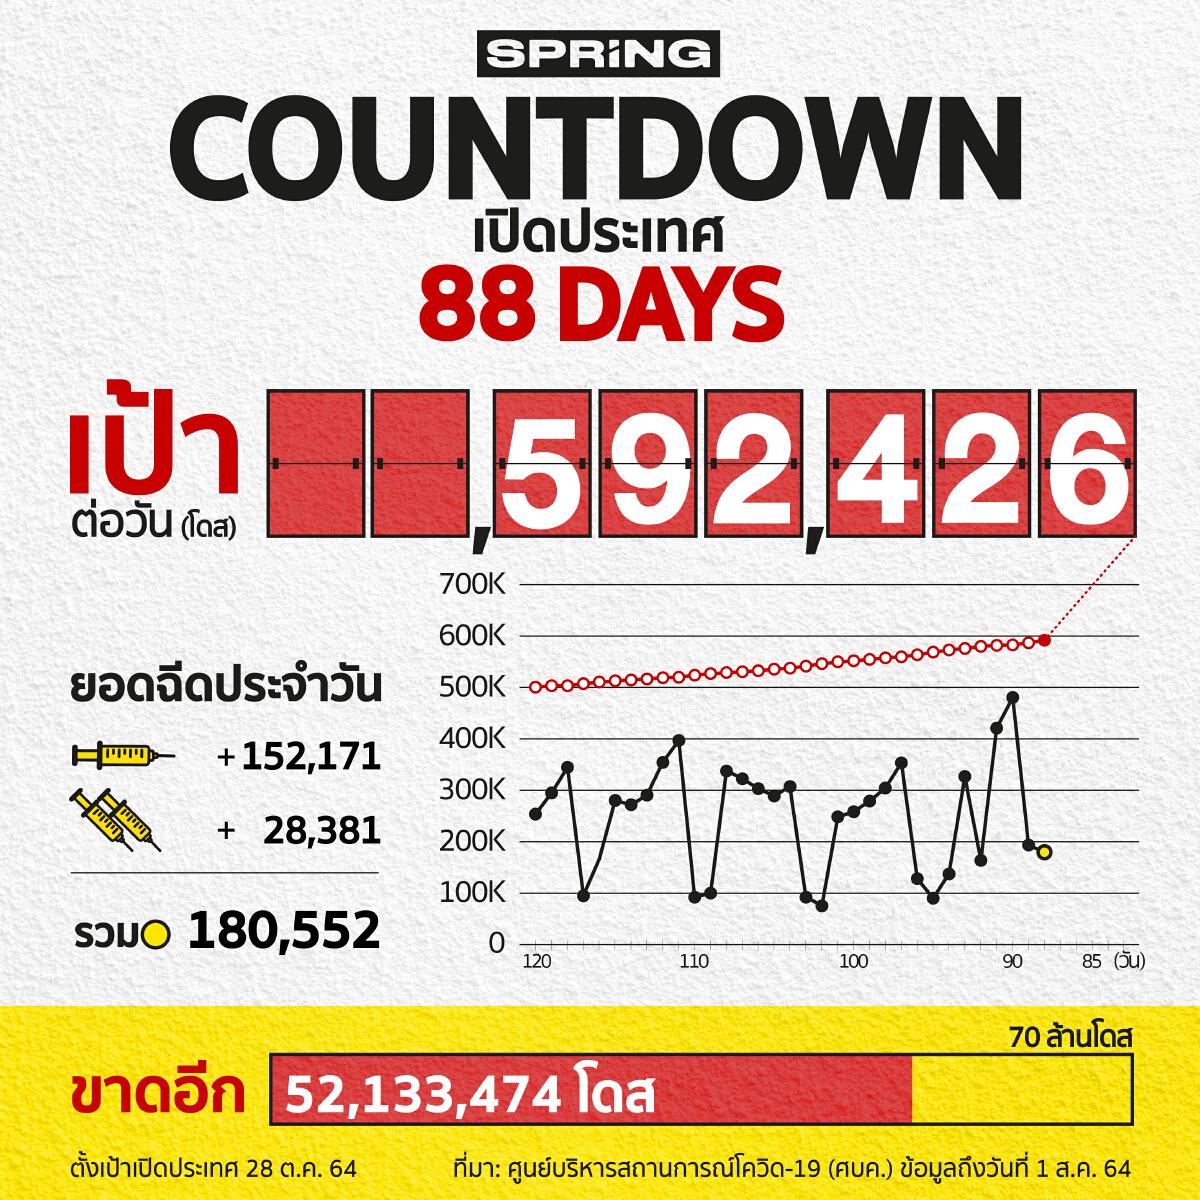 COUNTDOWN! เปิดประเทศใน 88 วัน ฉีดวัคซีนโควิด 180,552 โดส